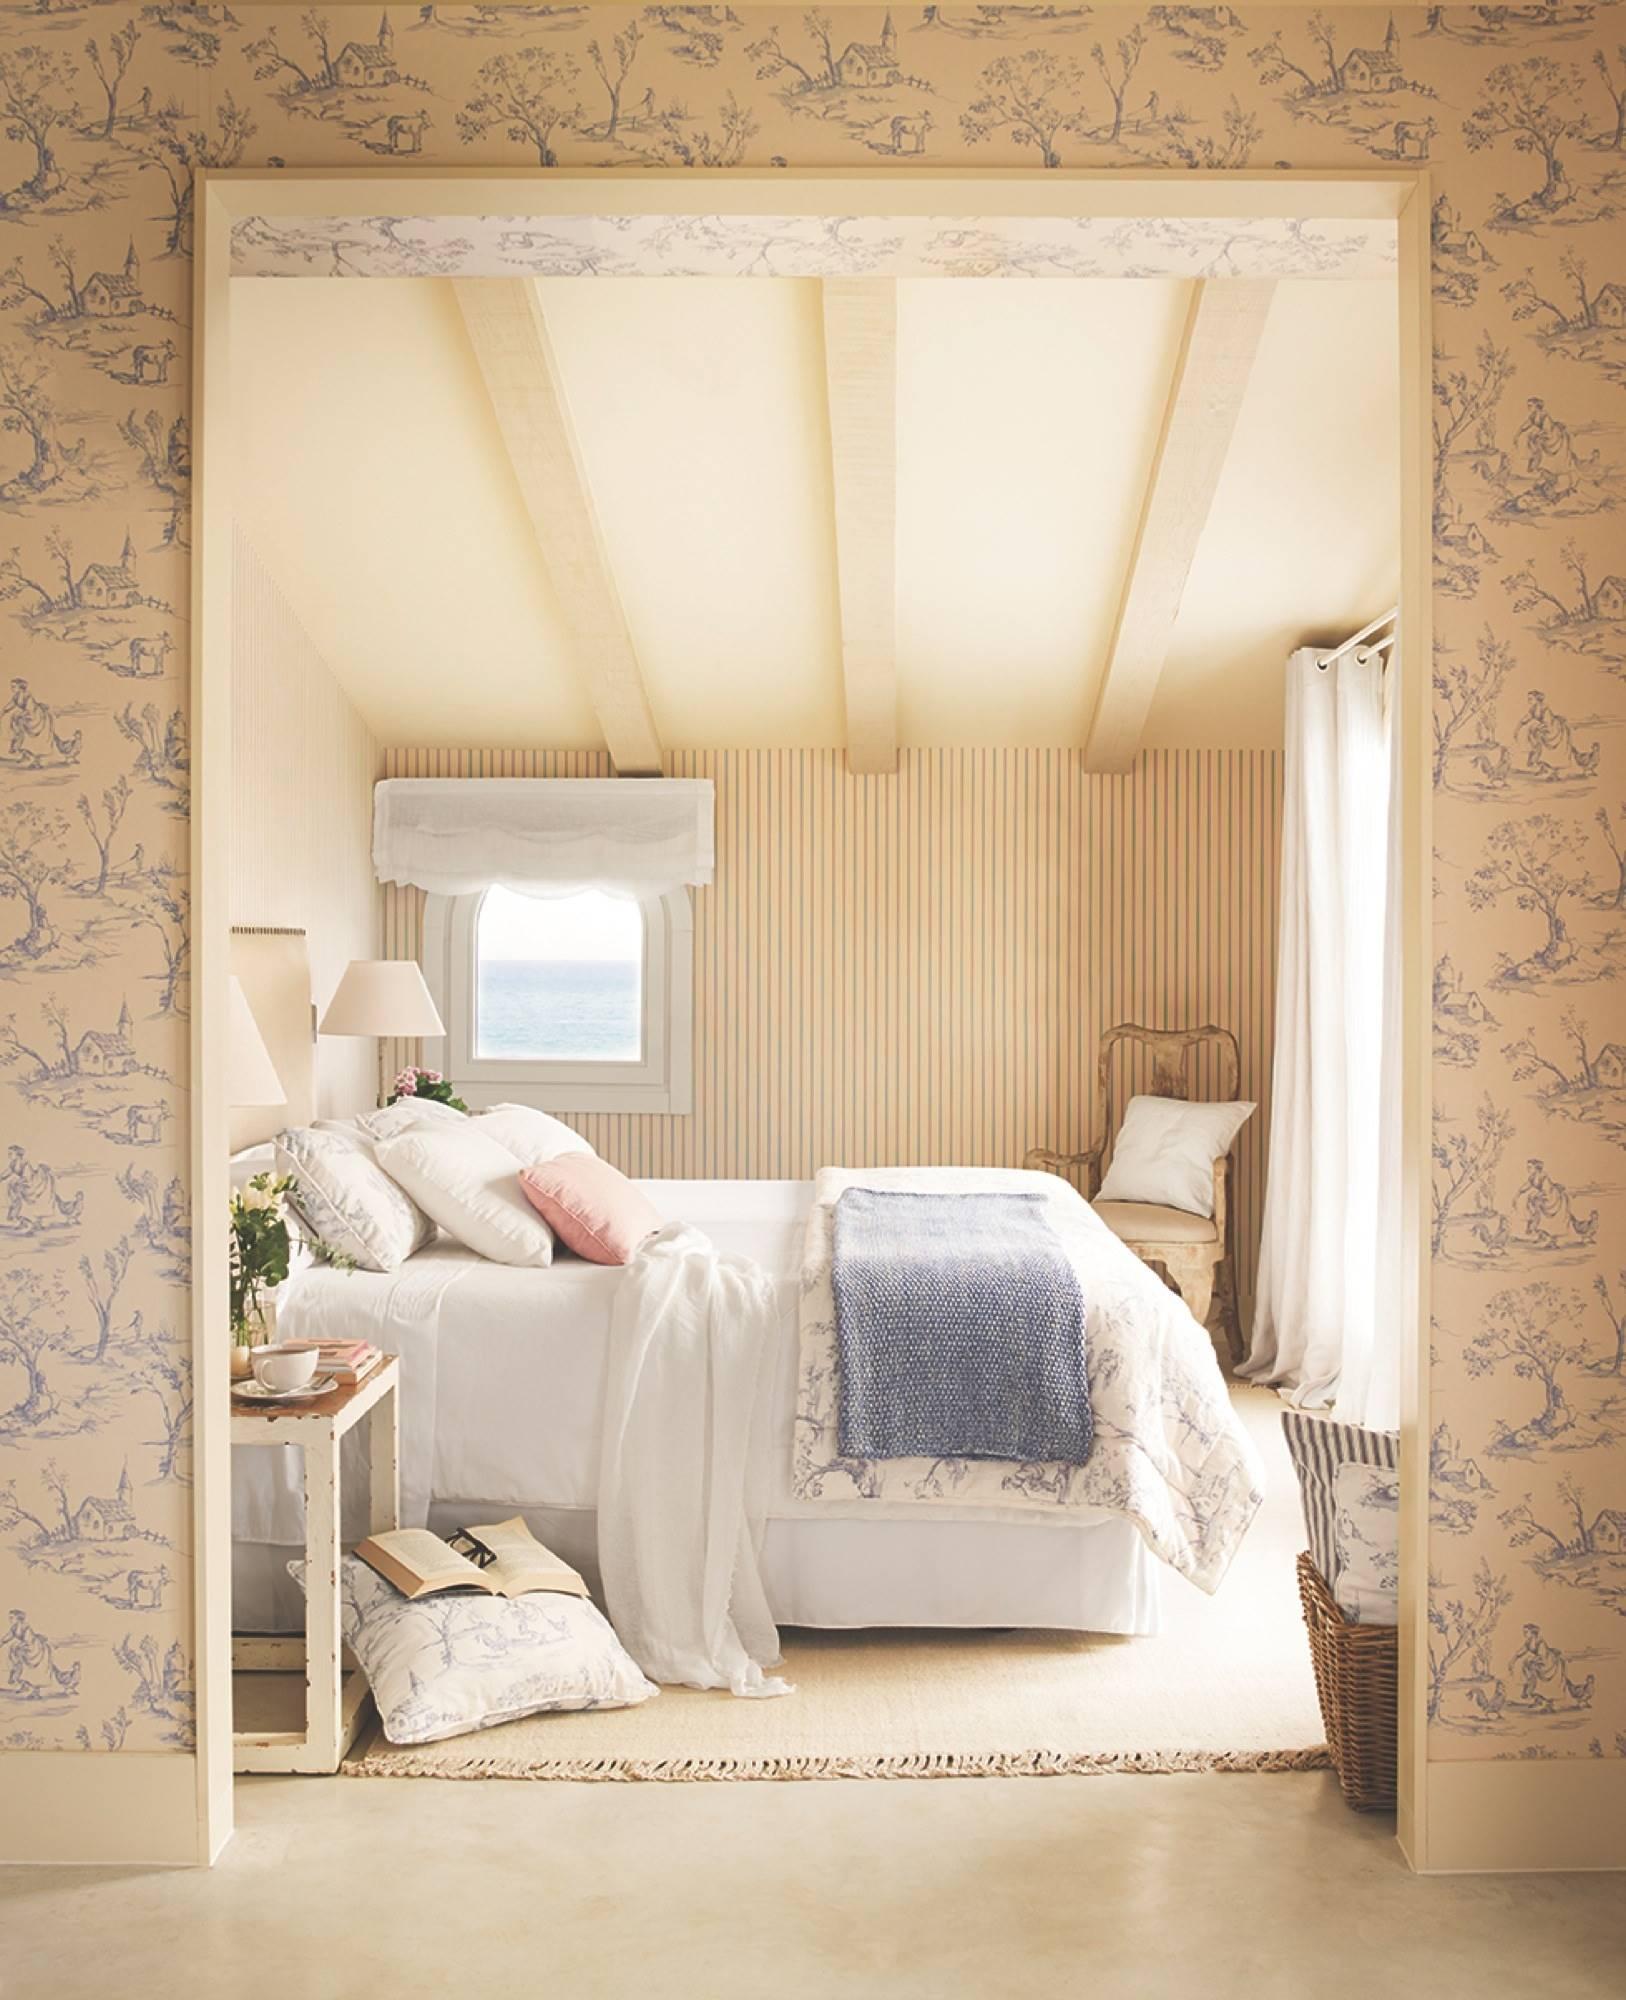 00426483 b9244398. Romantic bedroom